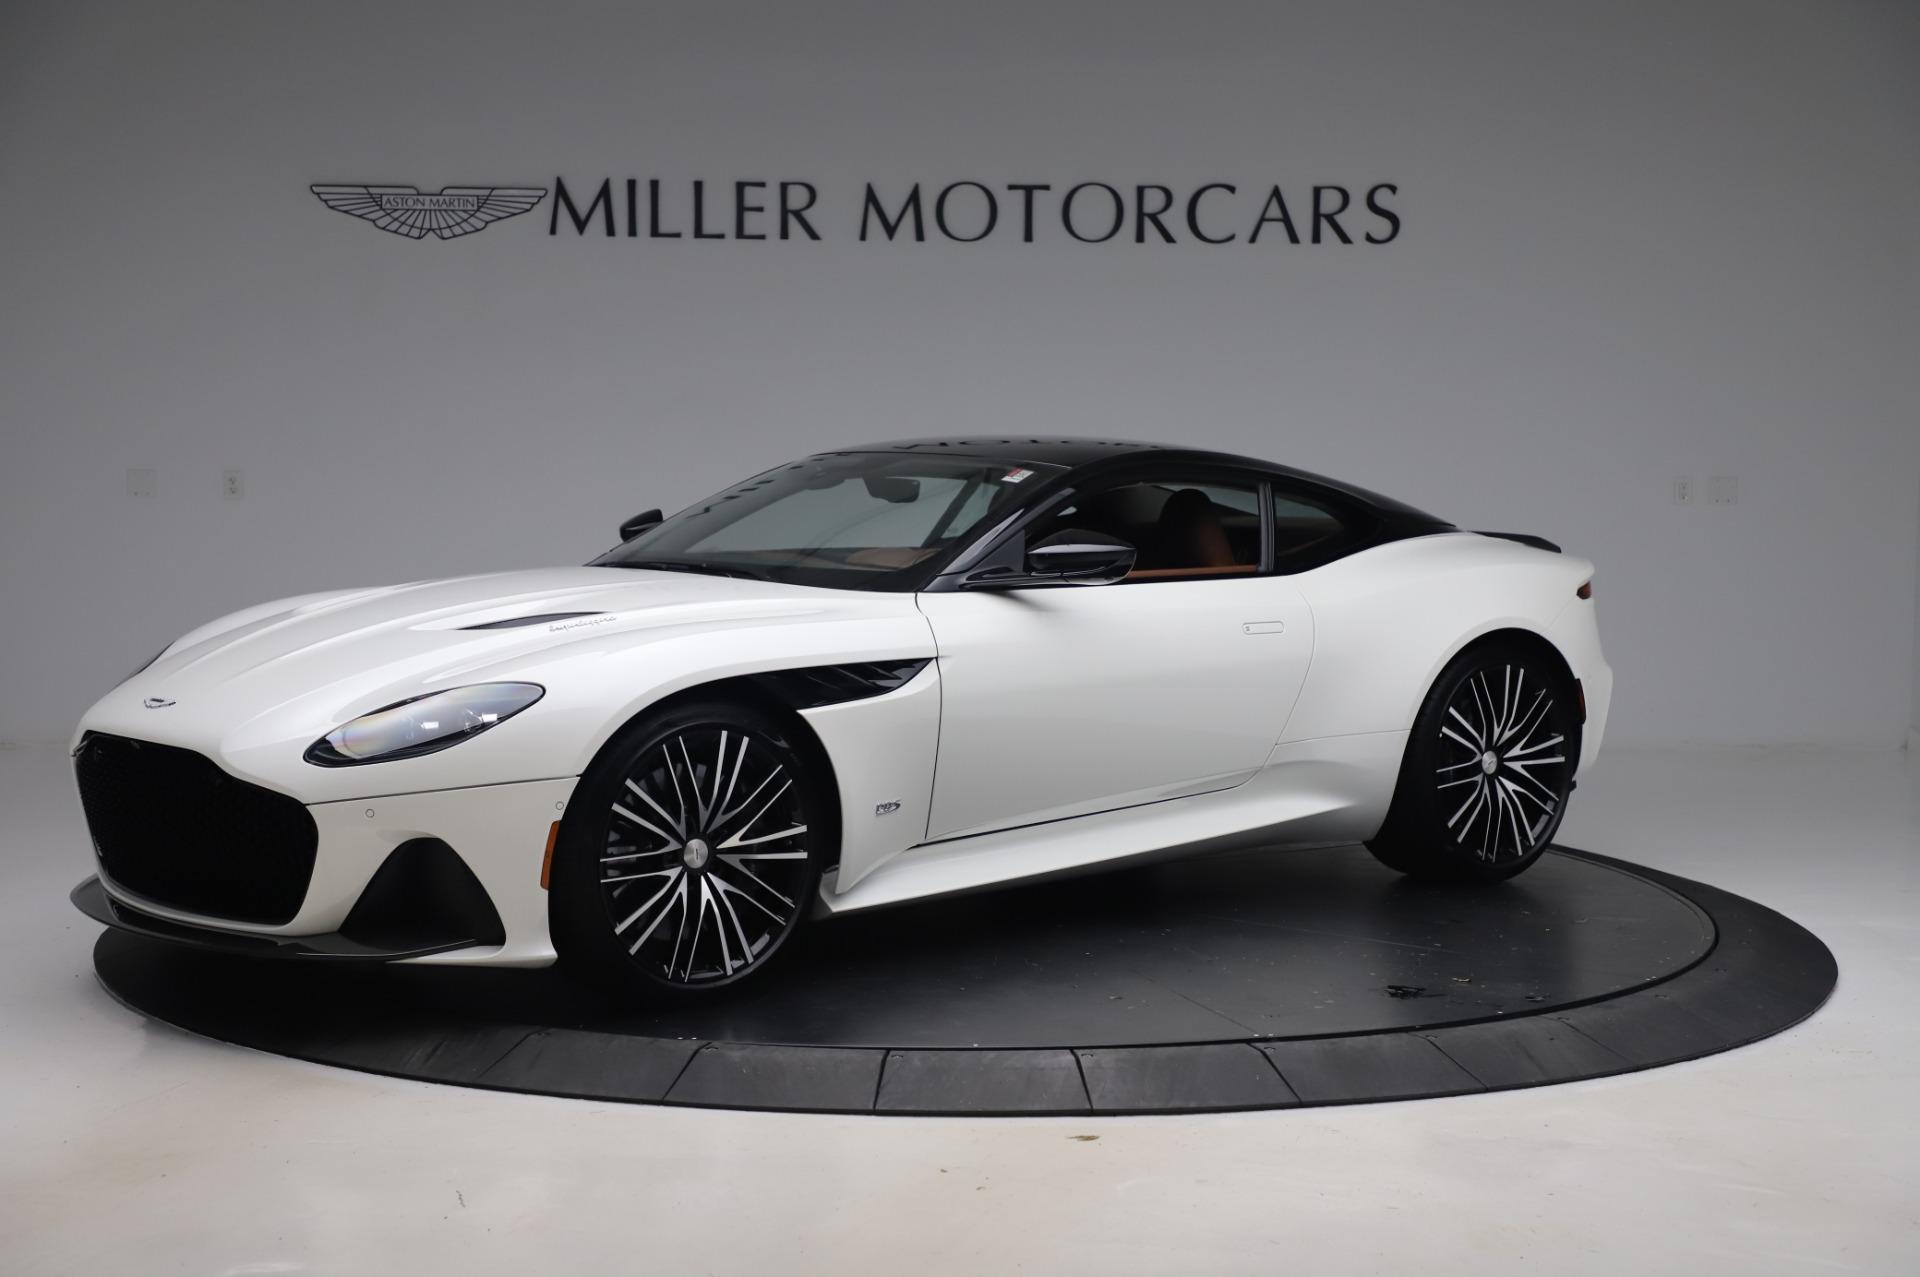 New 2020 Aston Martin DBS Superleggera Coupe for sale $337,686 at McLaren Greenwich in Greenwich CT 06830 1